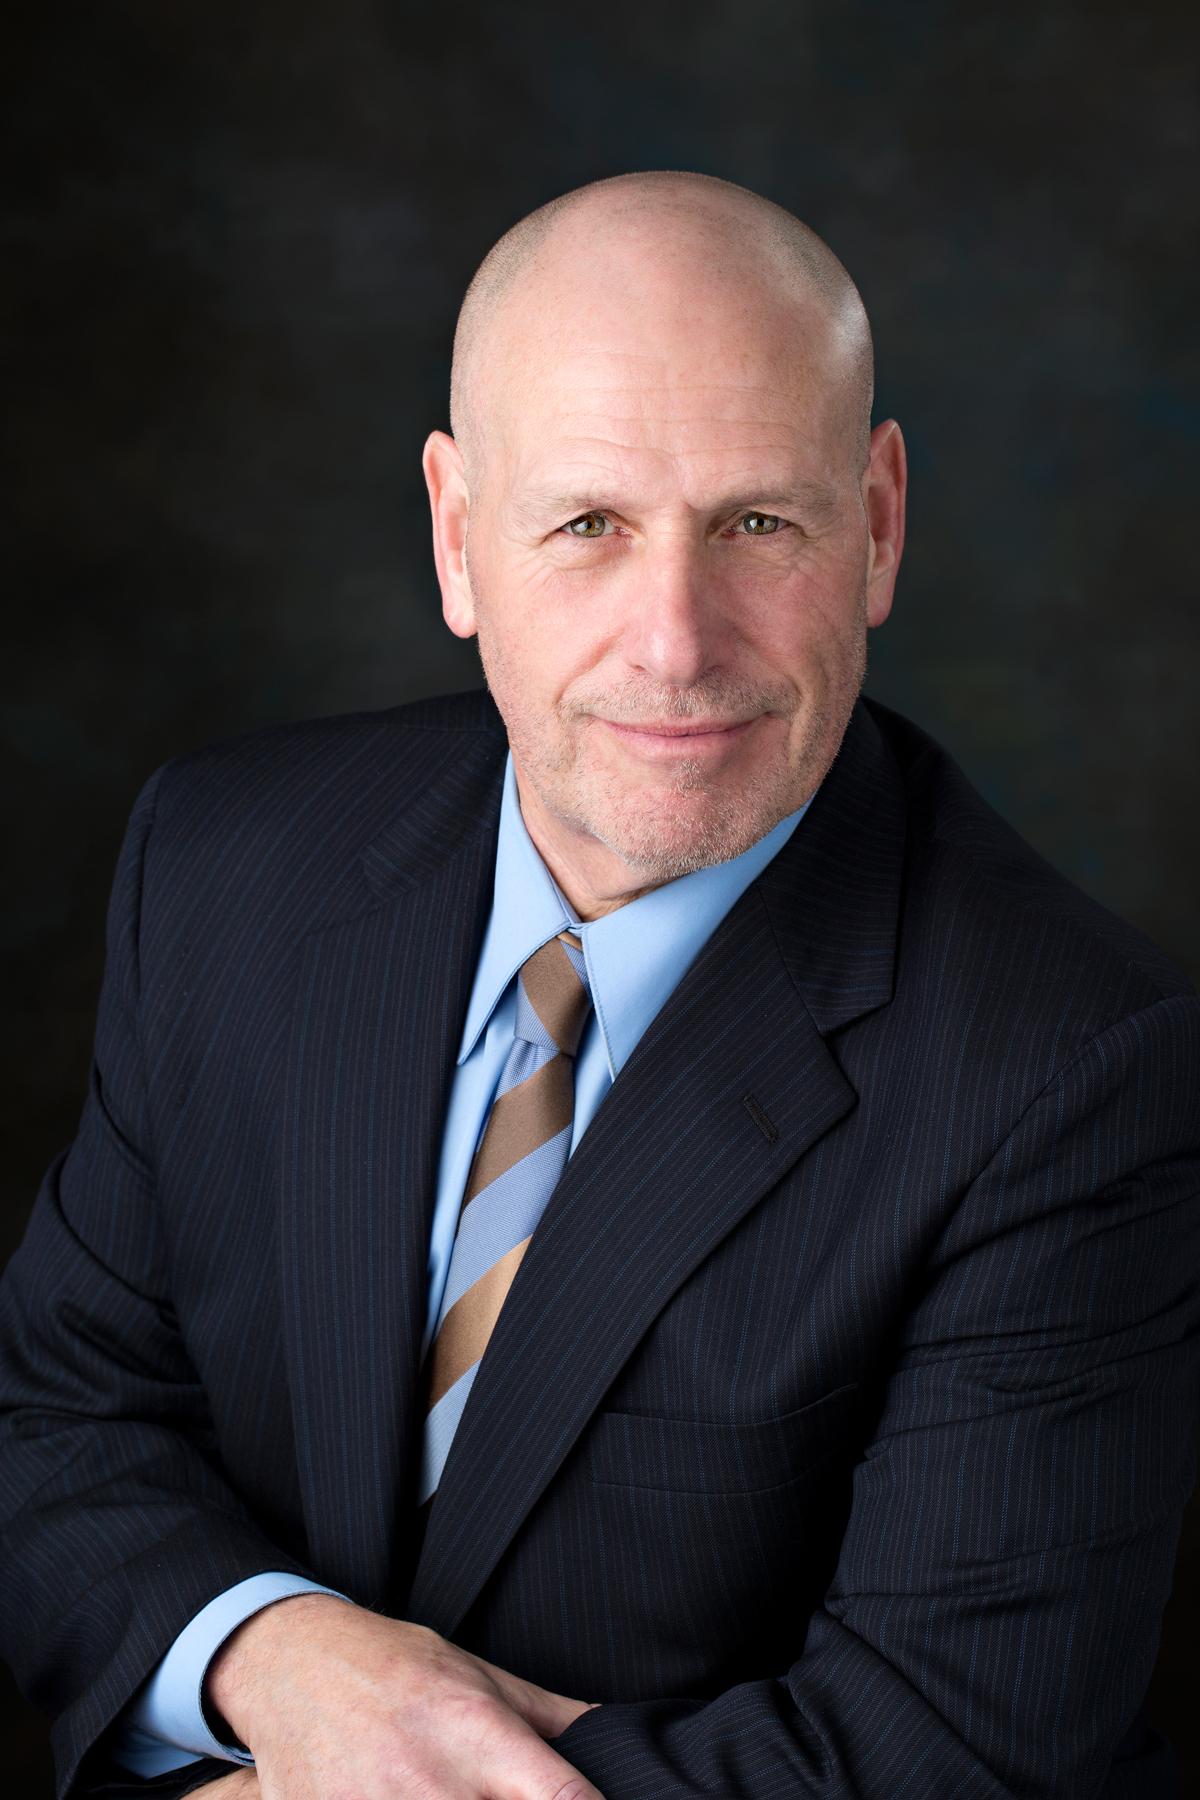 executive-portrait-NY-headshot-Photographer.jpg